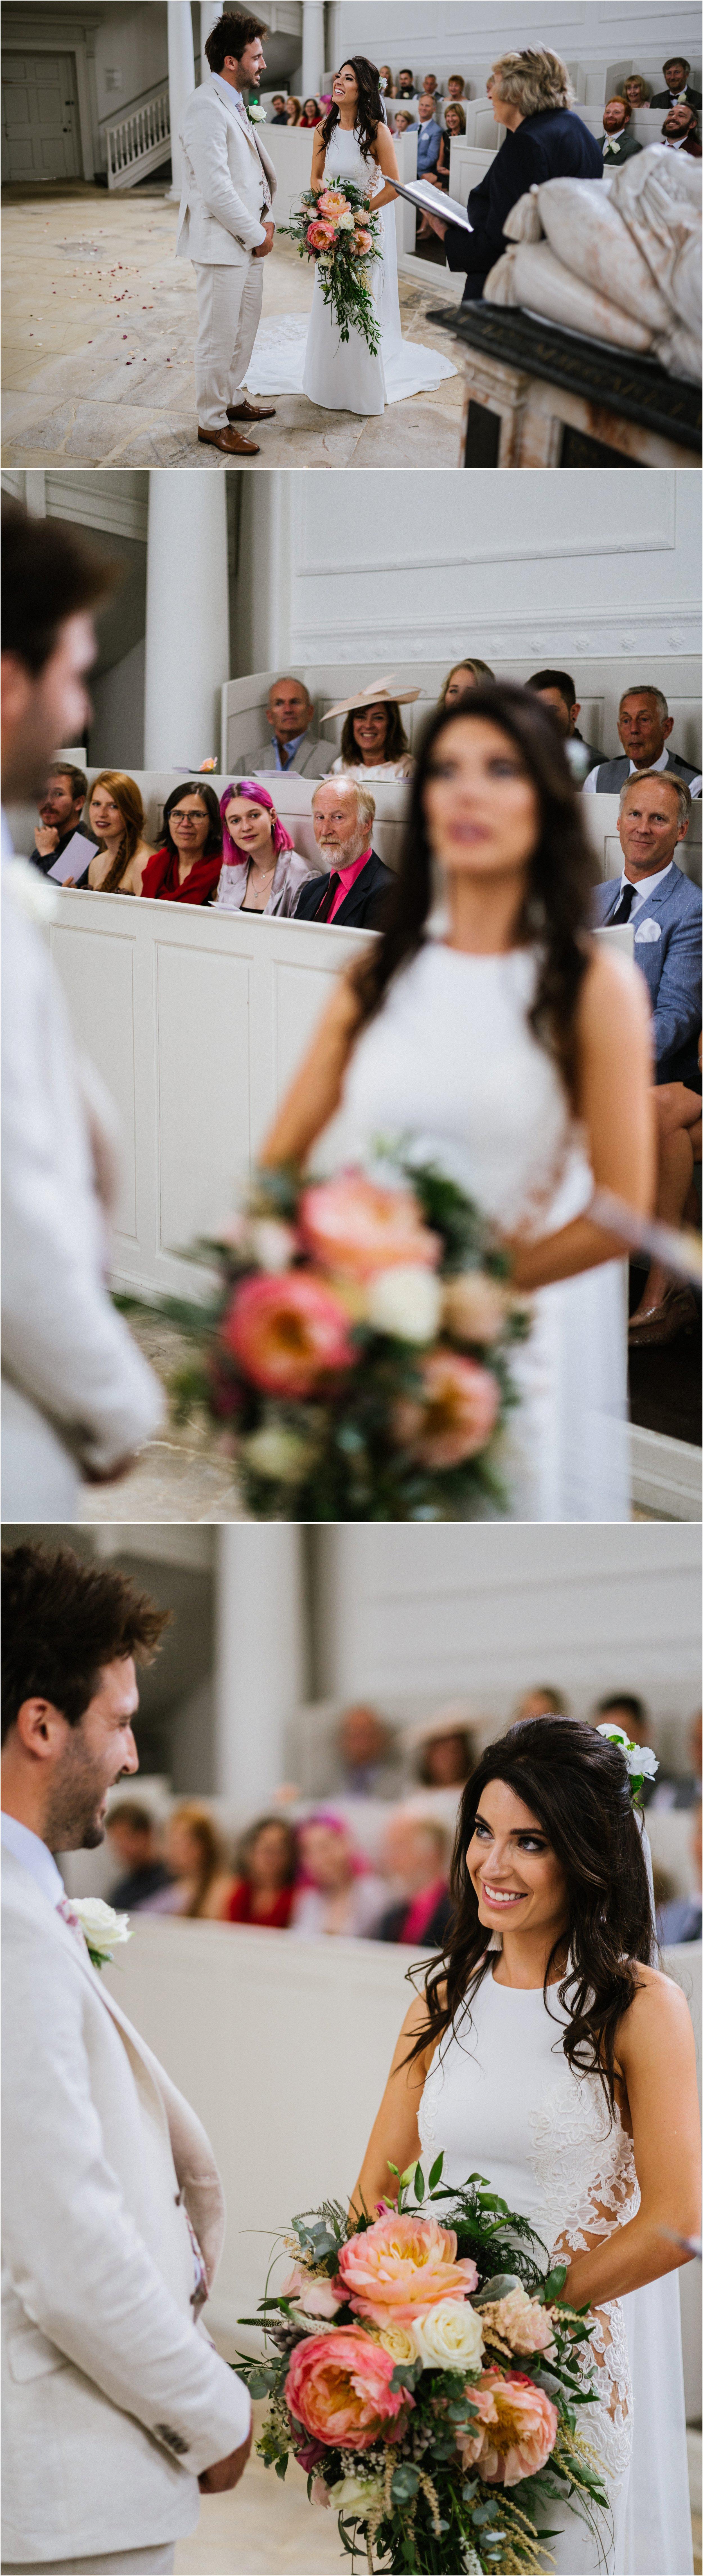 Compton Verney wedding photography_0058.jpg